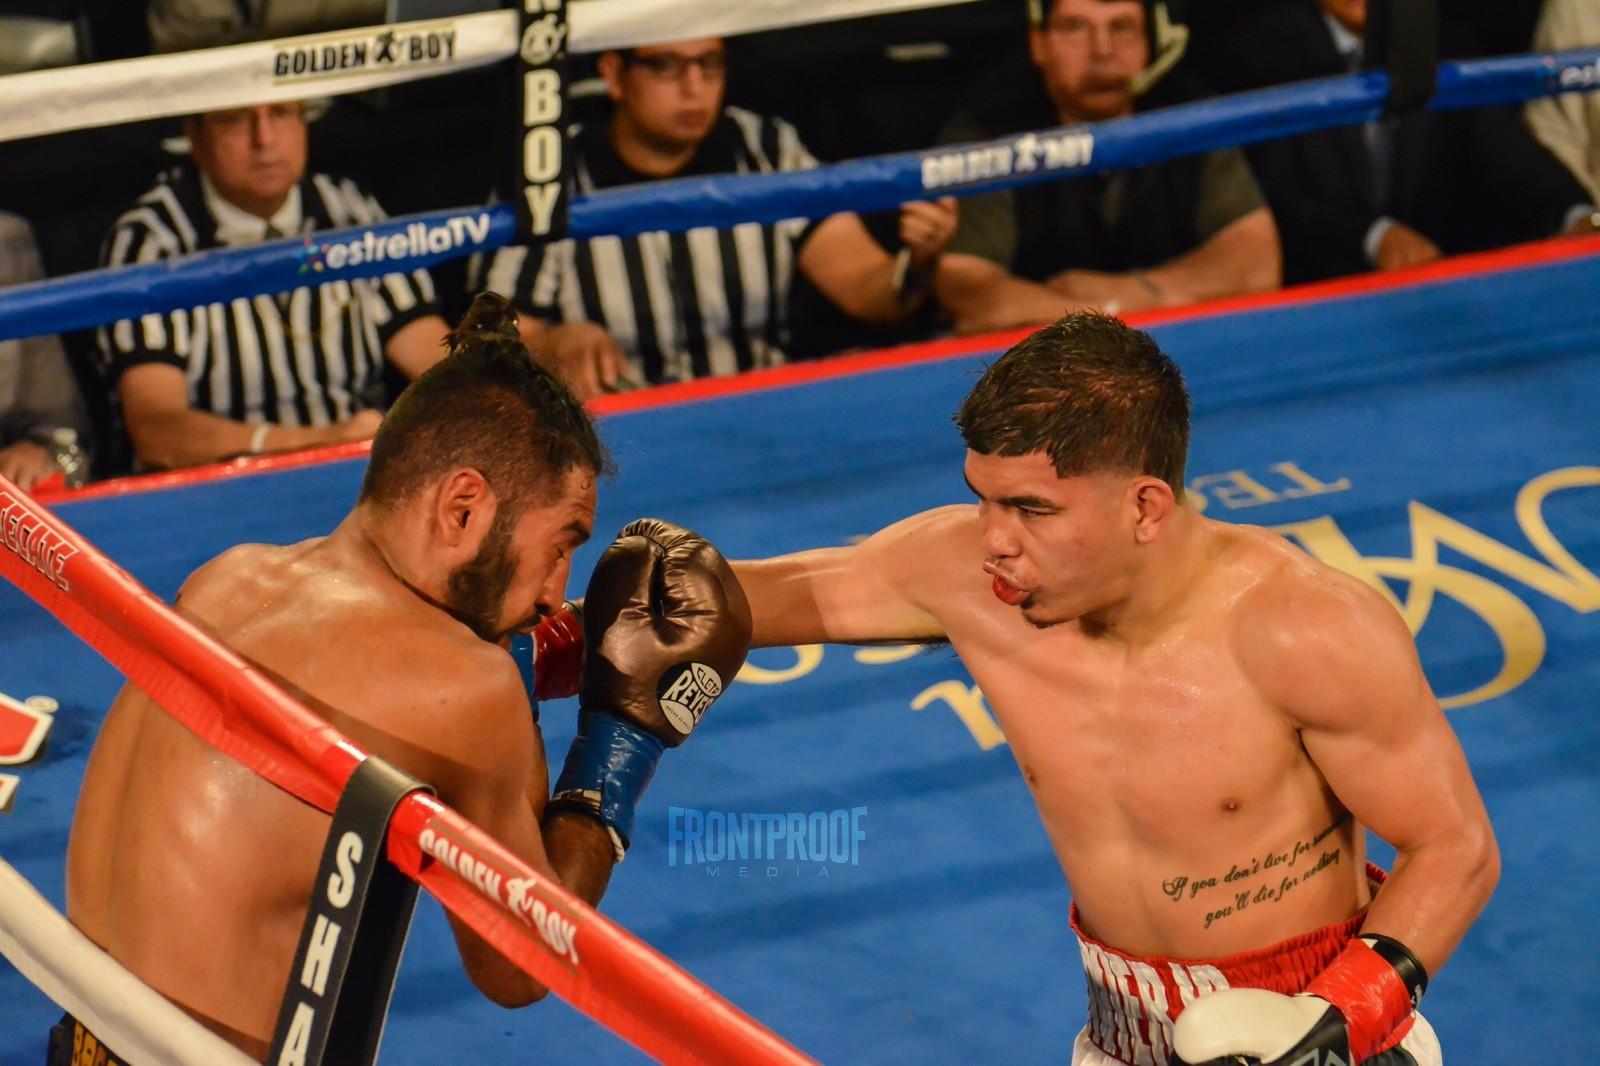 Javier Martinez lands a straight right on his opponent. Photo: Cynthia Saldaña/Frontproof Media